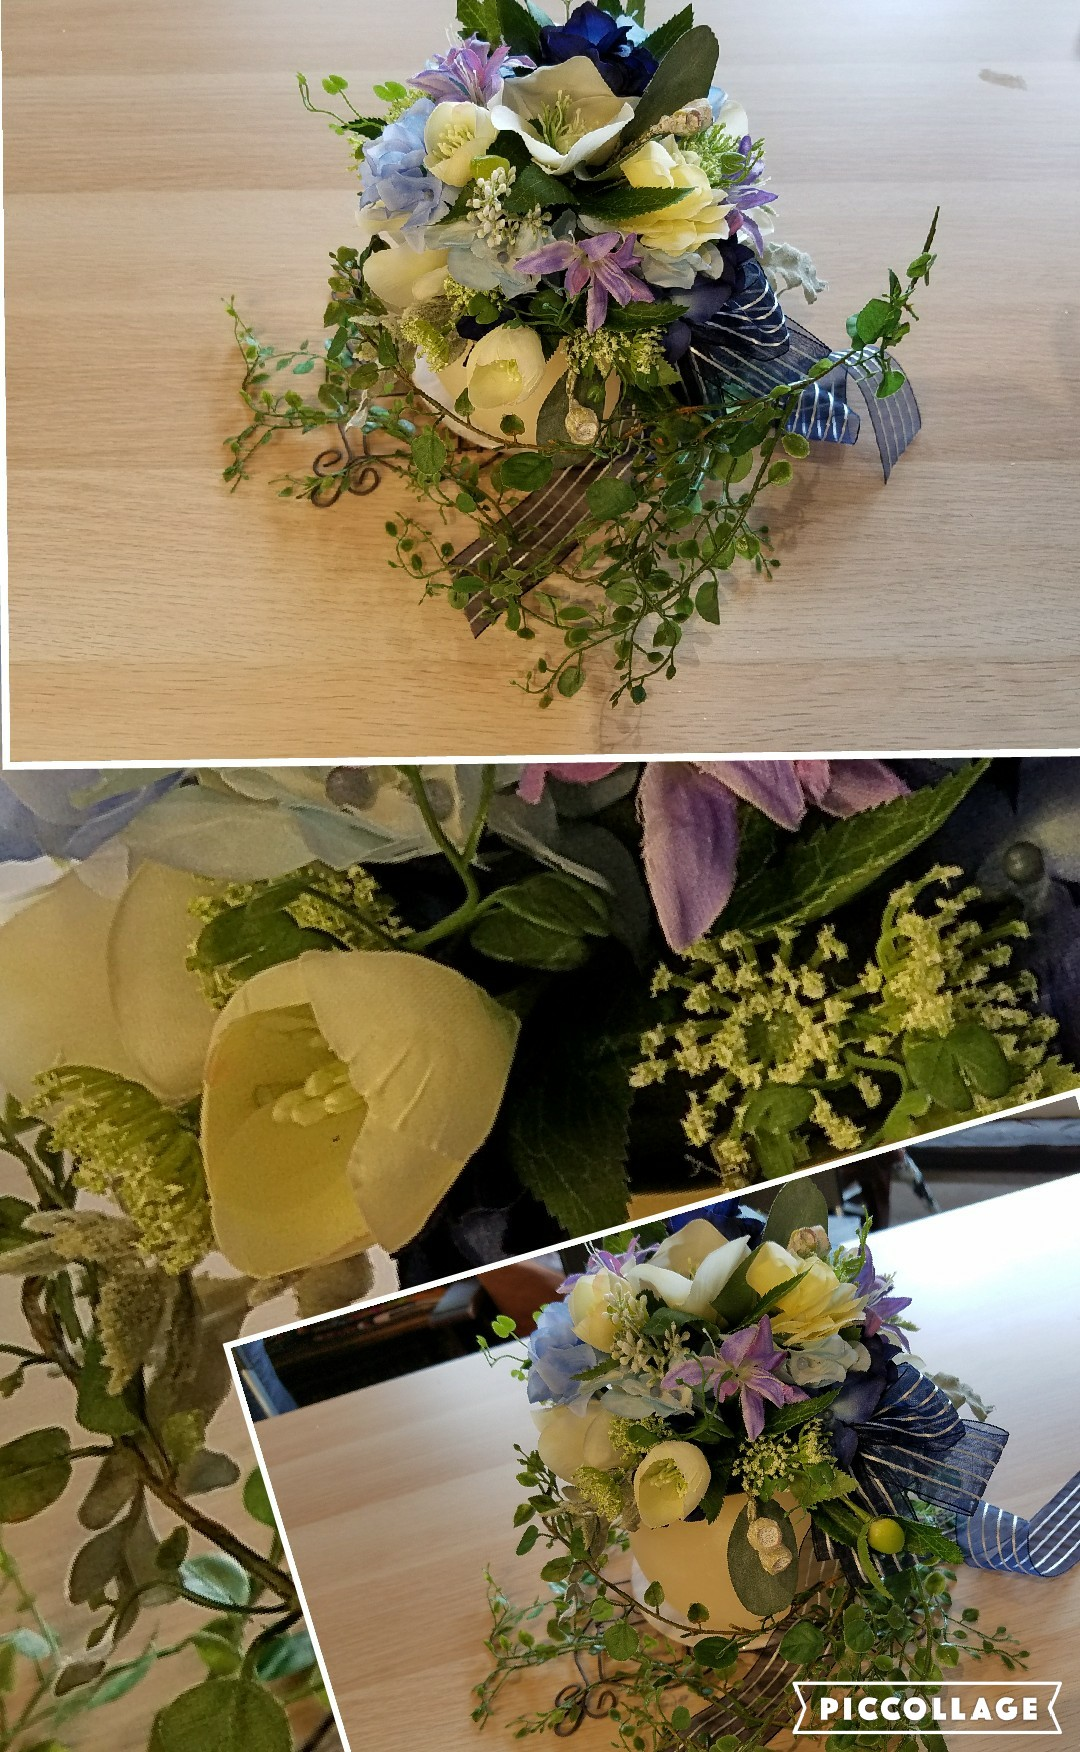 collage-2017-08-04-12_41_08.jpg.jpg